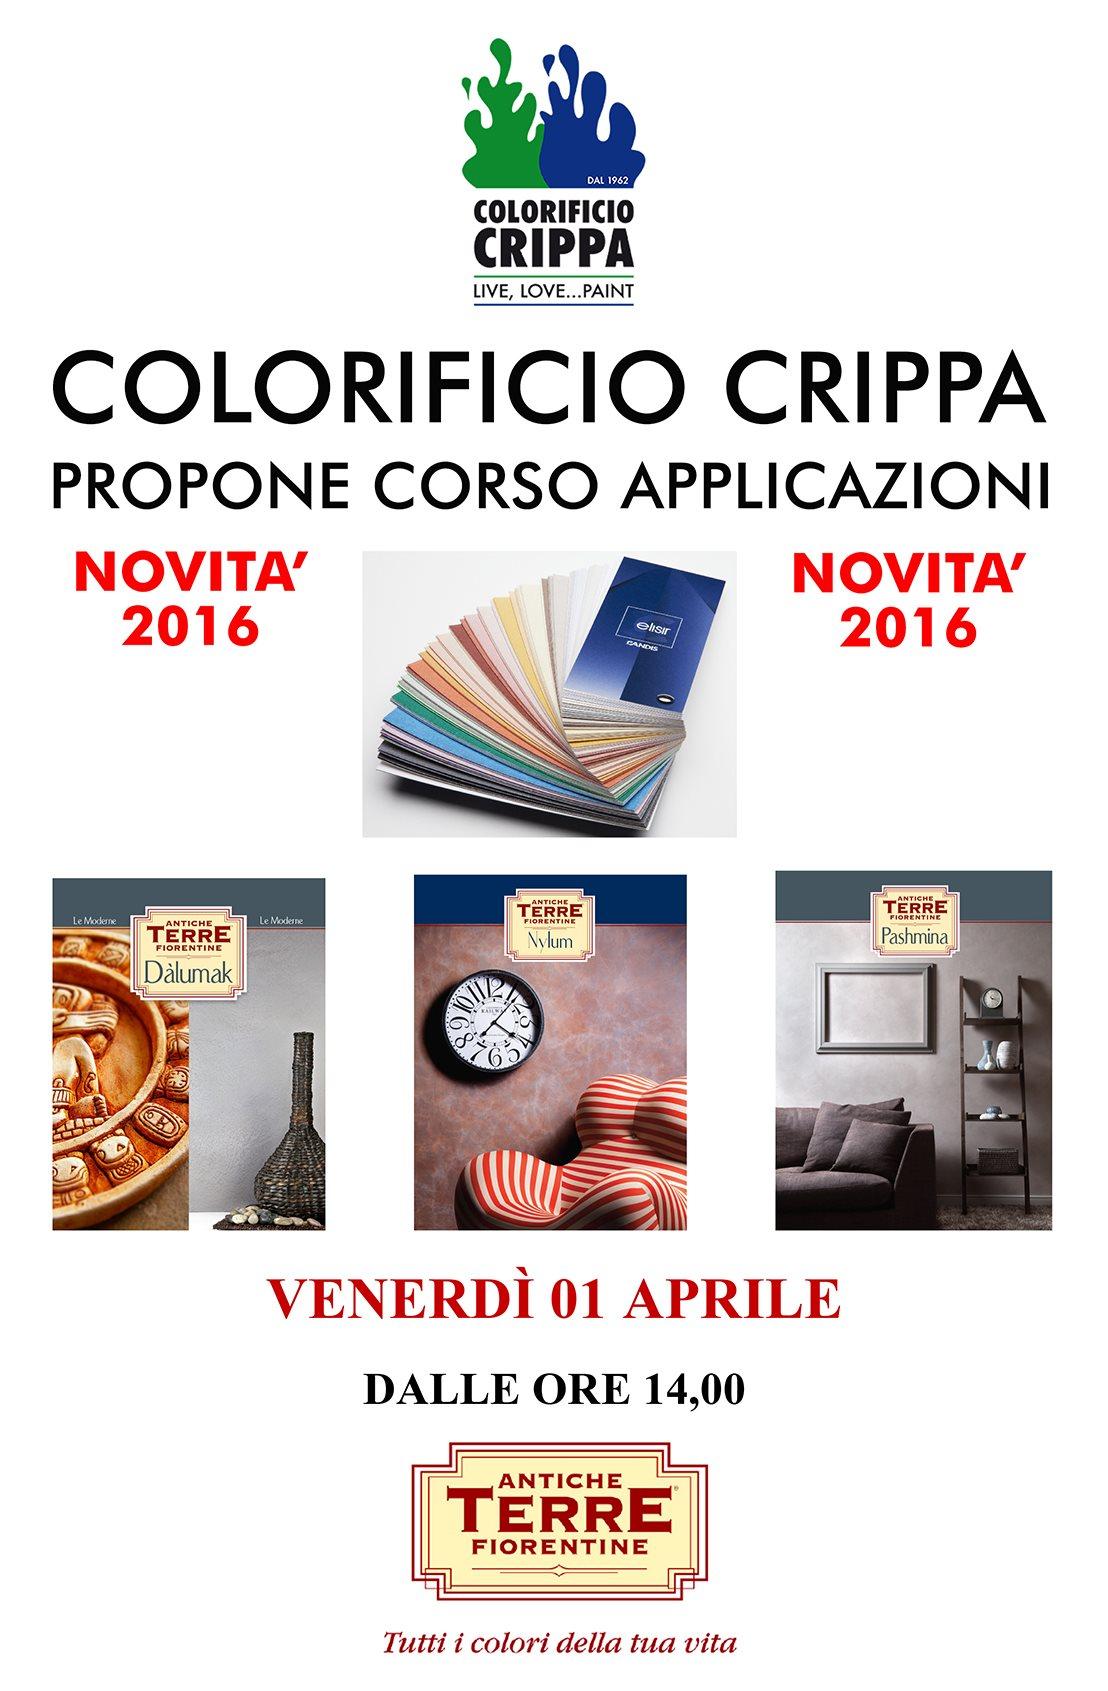 LOCANDINA_CANDIS_CRIPPA_01042016